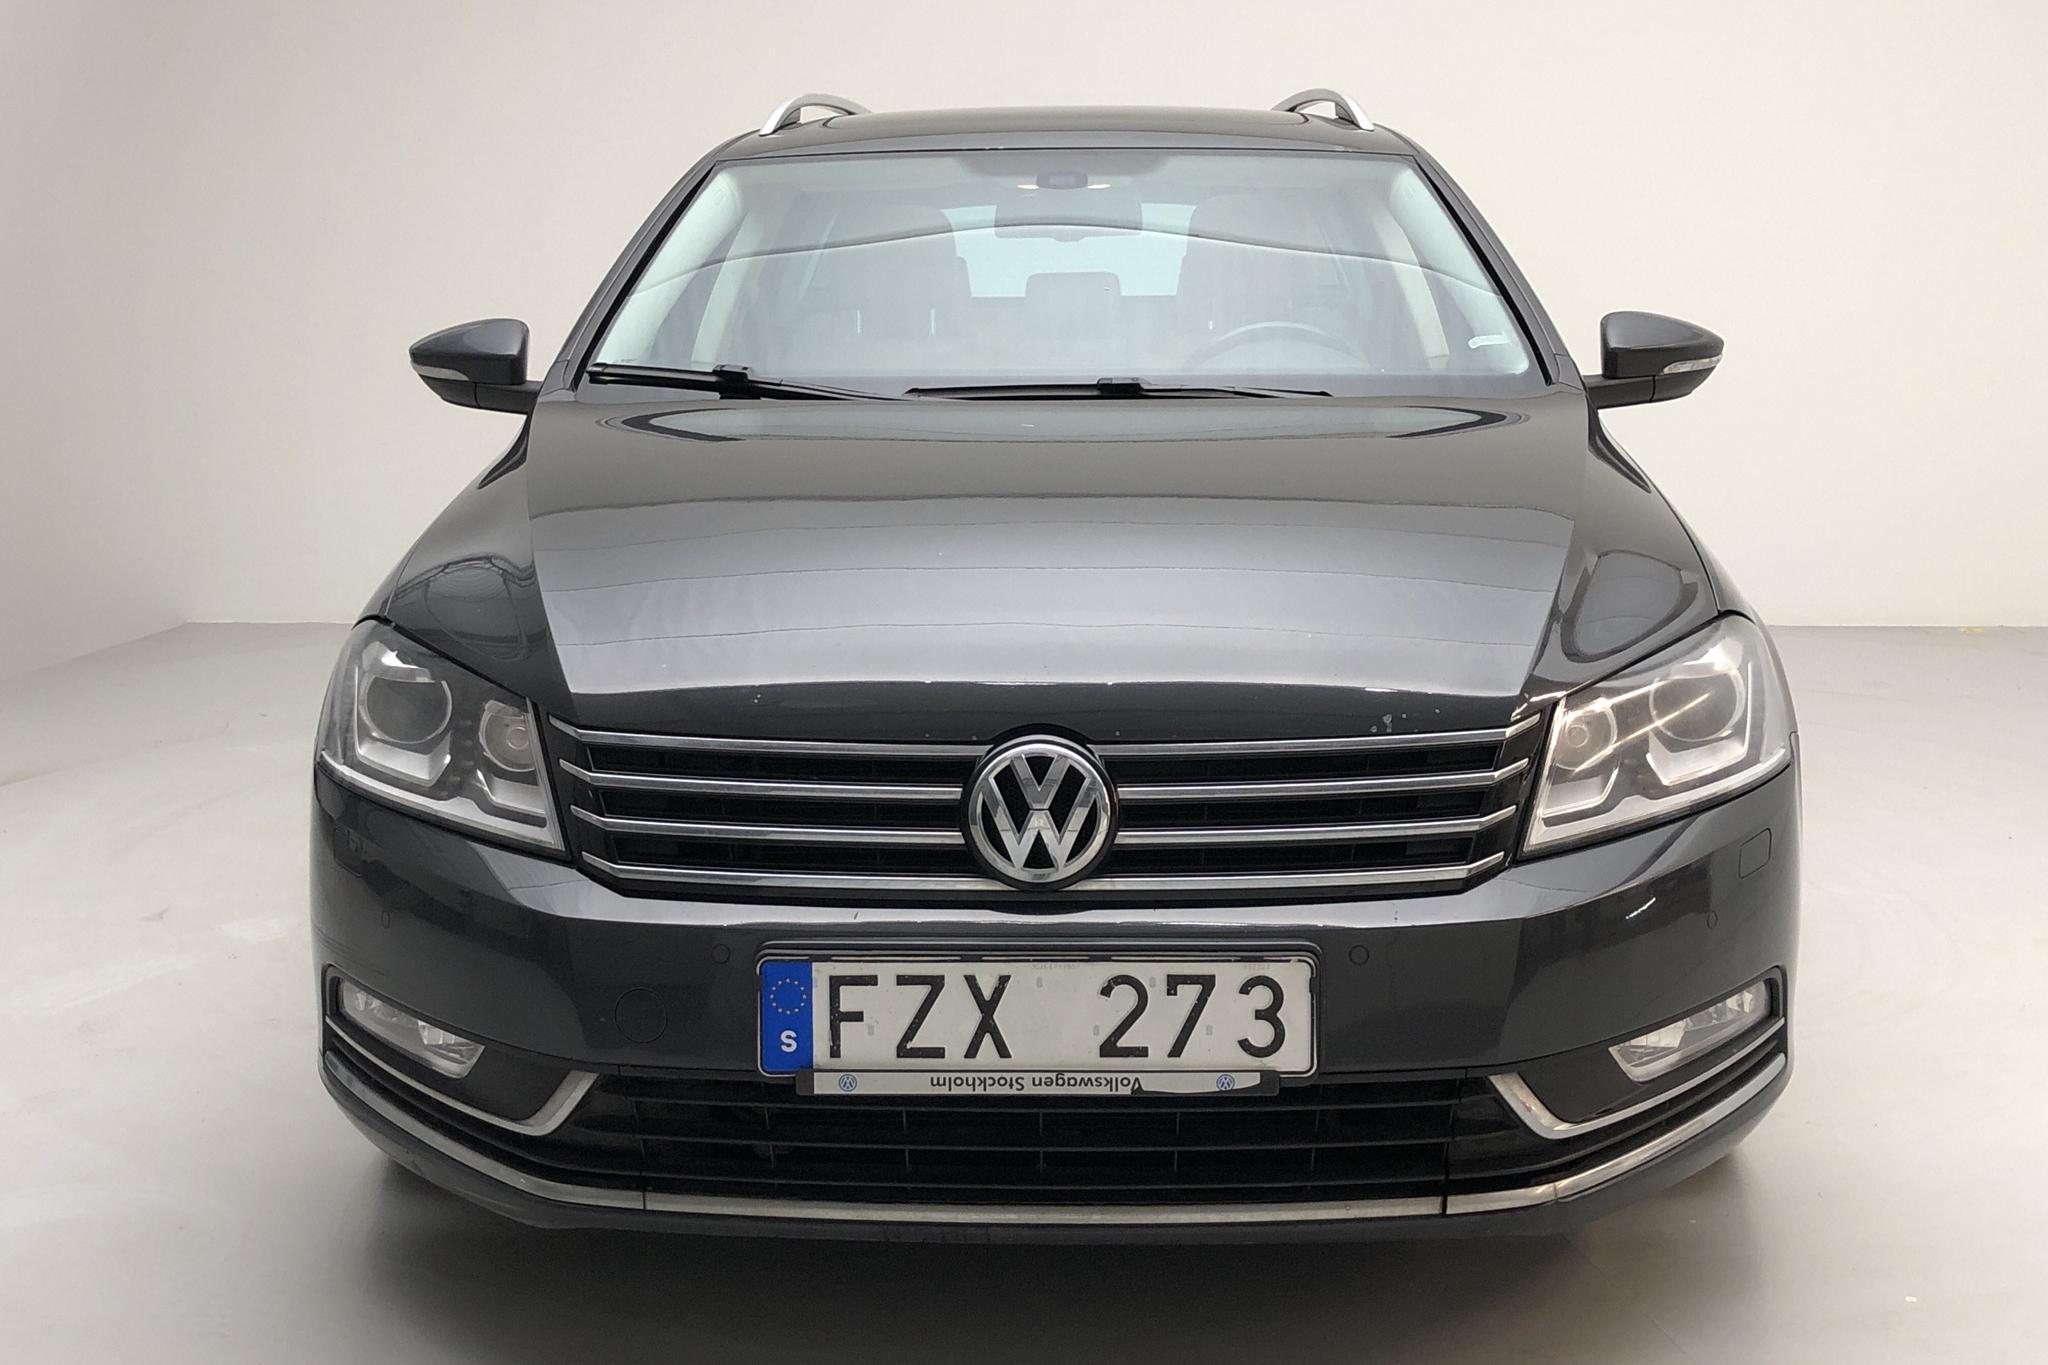 VW Passat 2.0 TDI BlueMotion Technology Variant (170hk) - 16 208 mil - Automat - Dark Grey - 2012